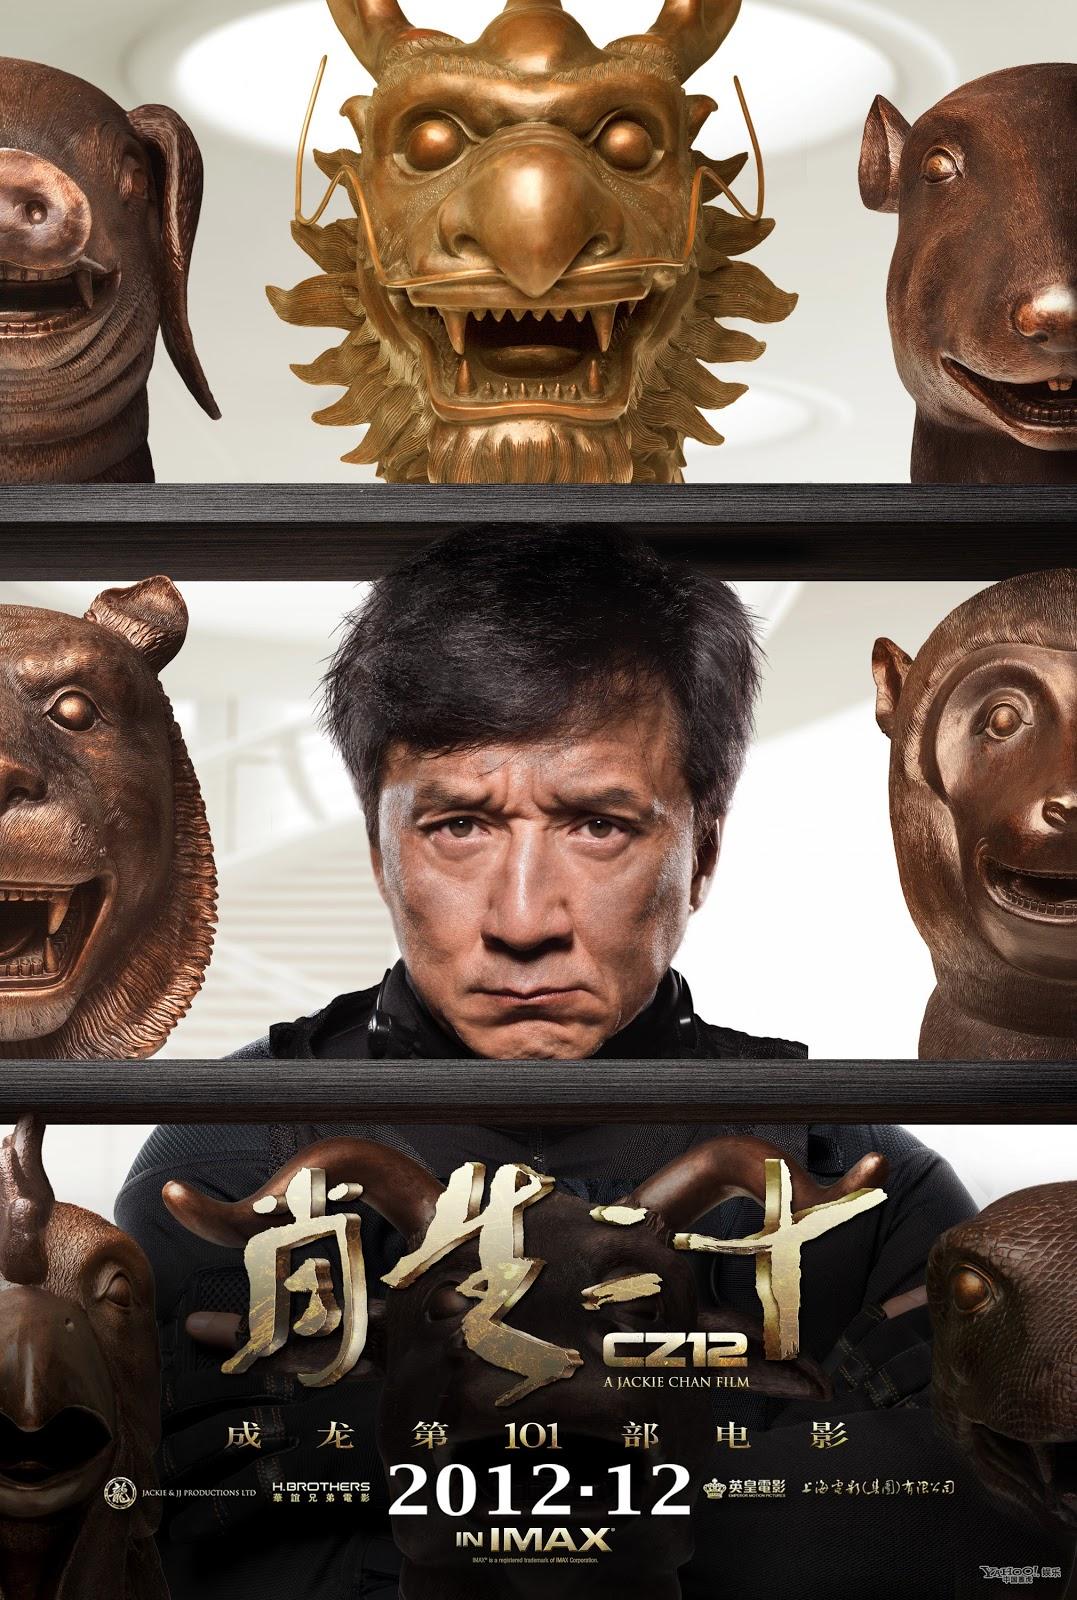 http://3.bp.blogspot.com/-YecC0LP5M4k/UKj4RsYXqlI/AAAAAAAAGNE/P23Yr428YxE/s1600/chinese+zodiac.jpg